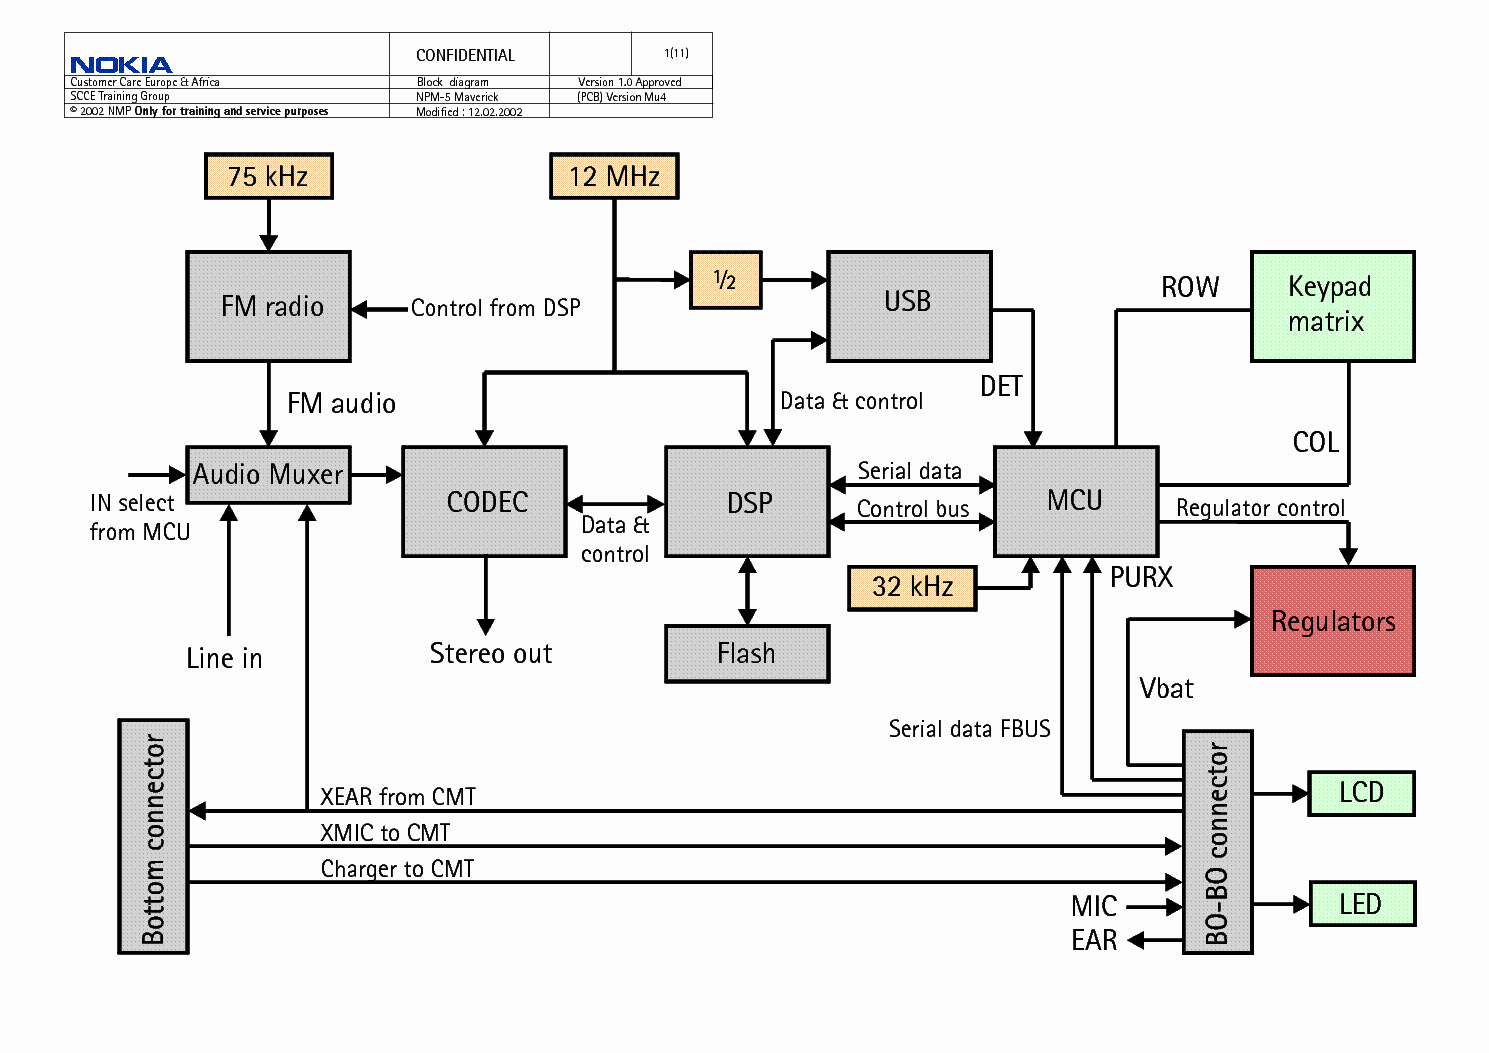 hight resolution of 1489x1053 block diagram drawing images free download wiring diagram mechanical engineering drawing symbols pdf free